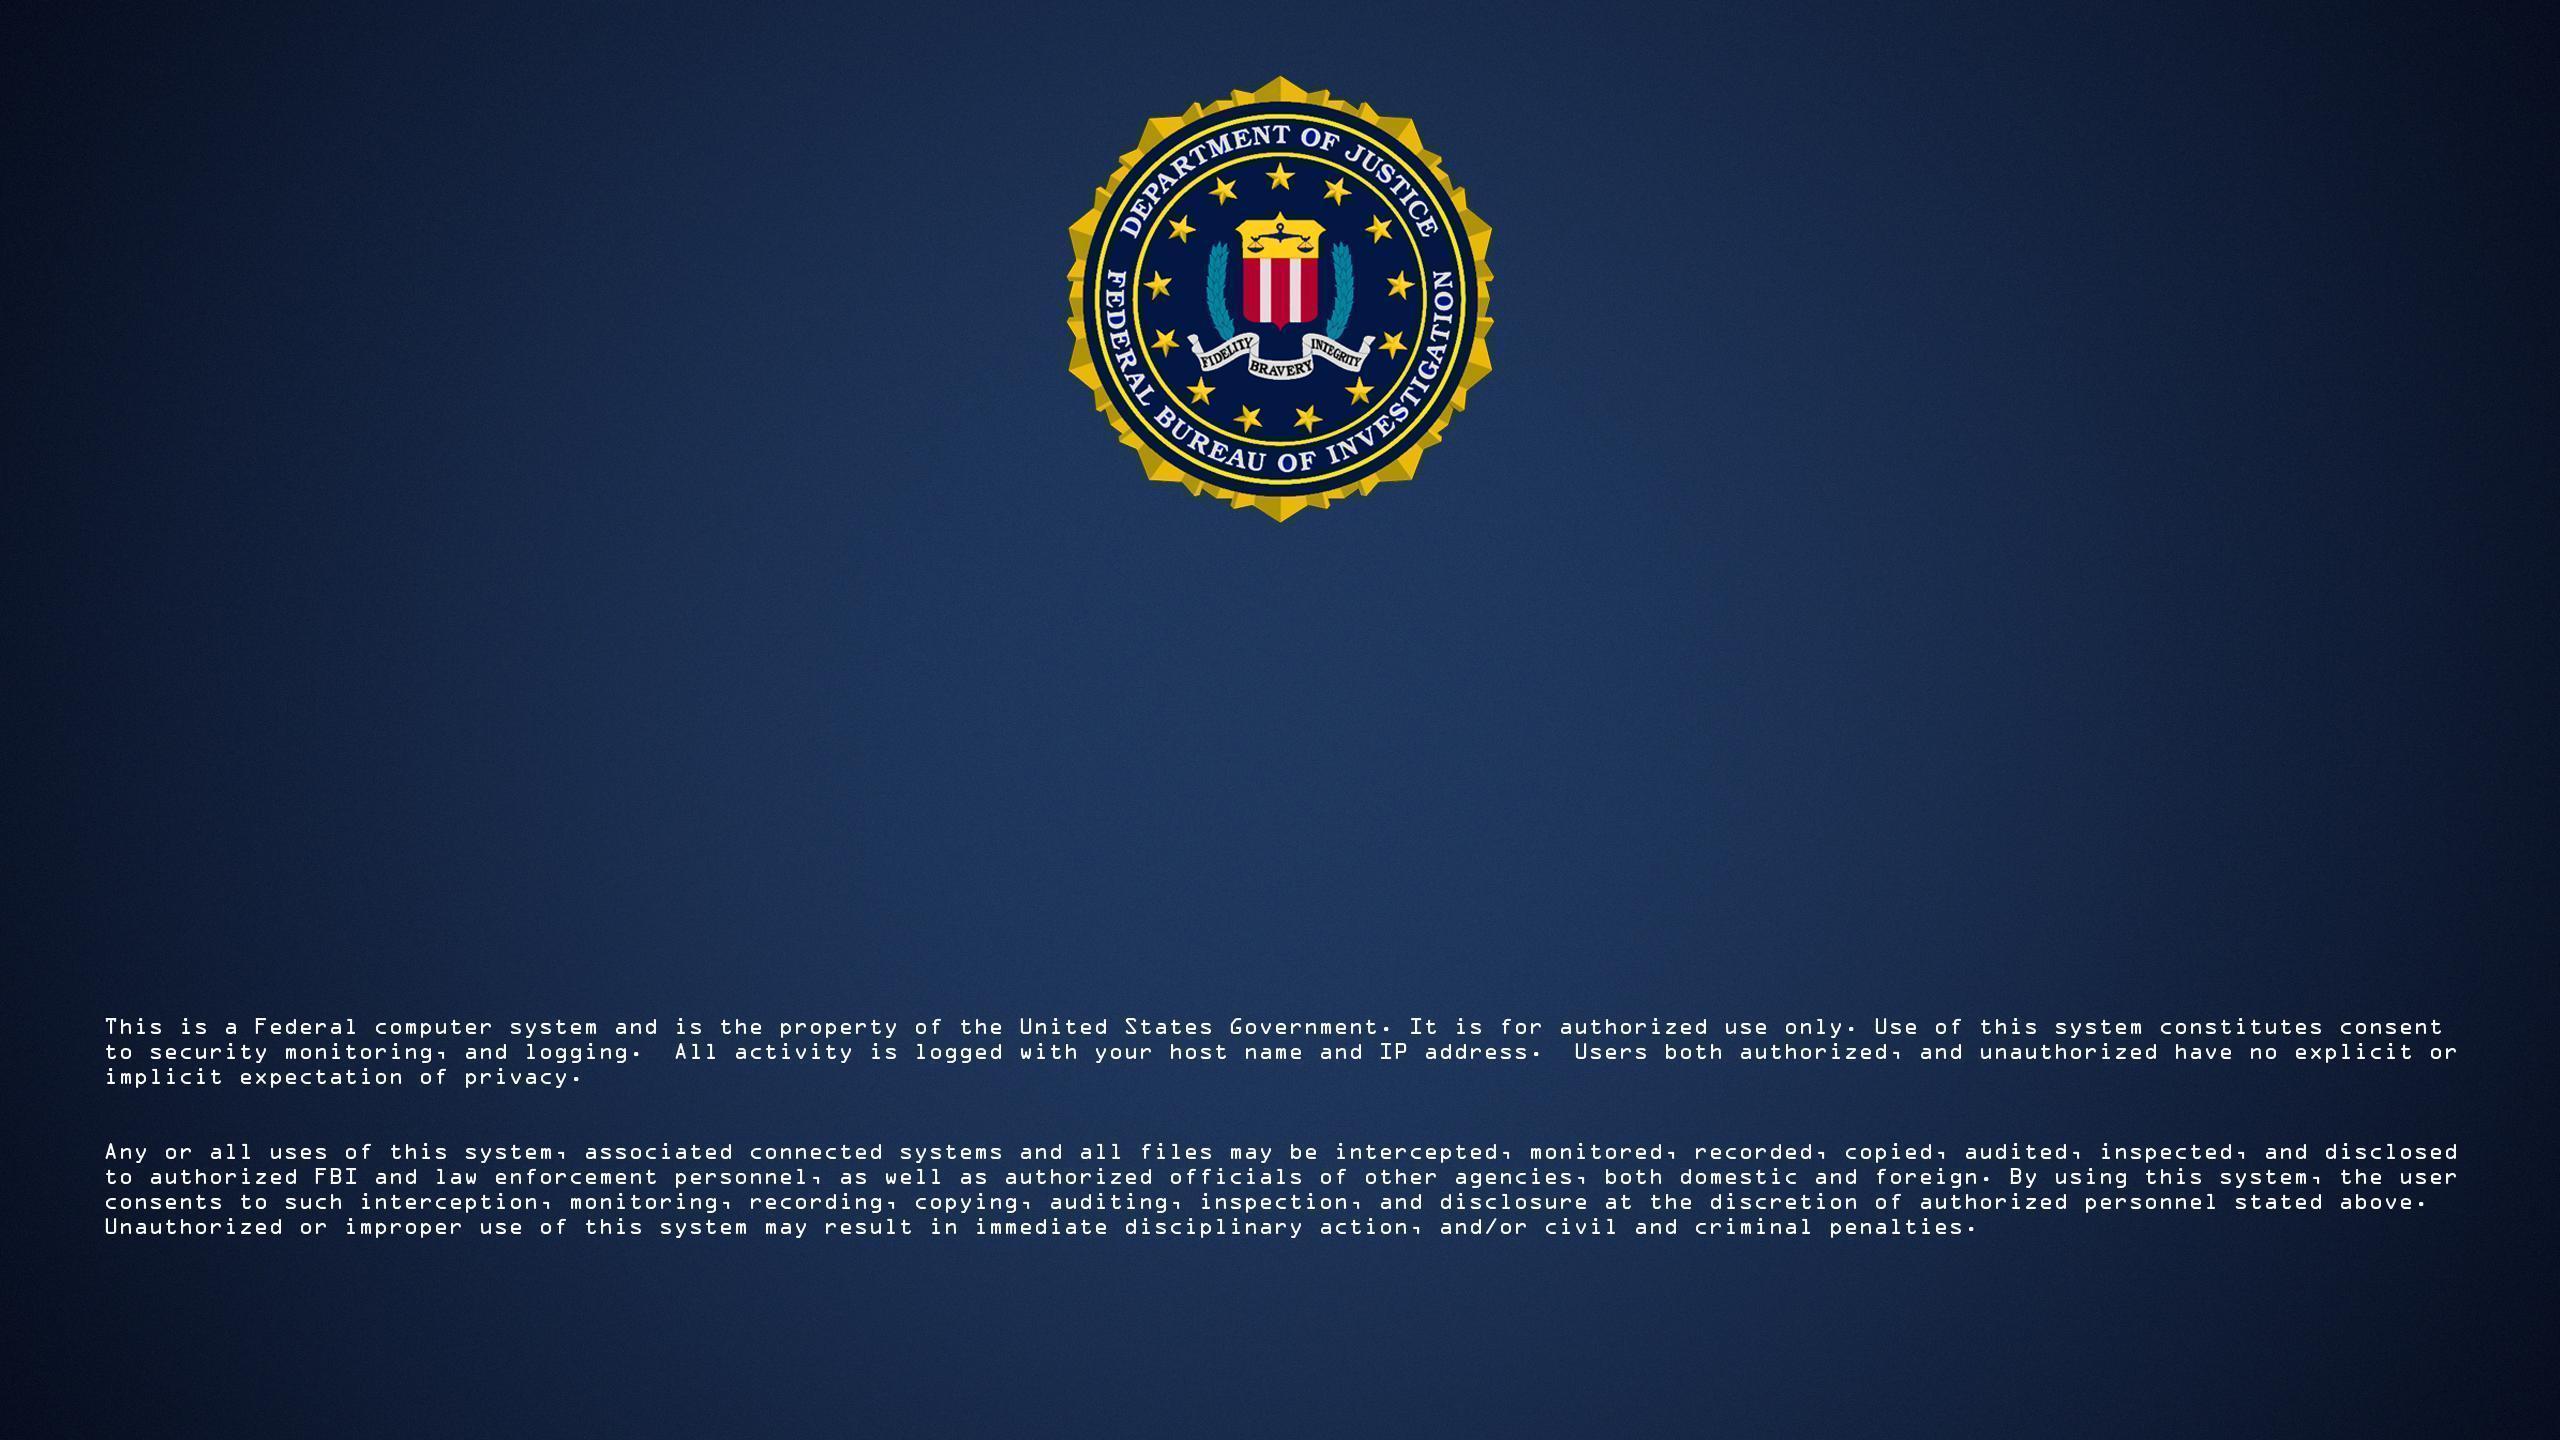 fbi screensaver related keywords - photo #7